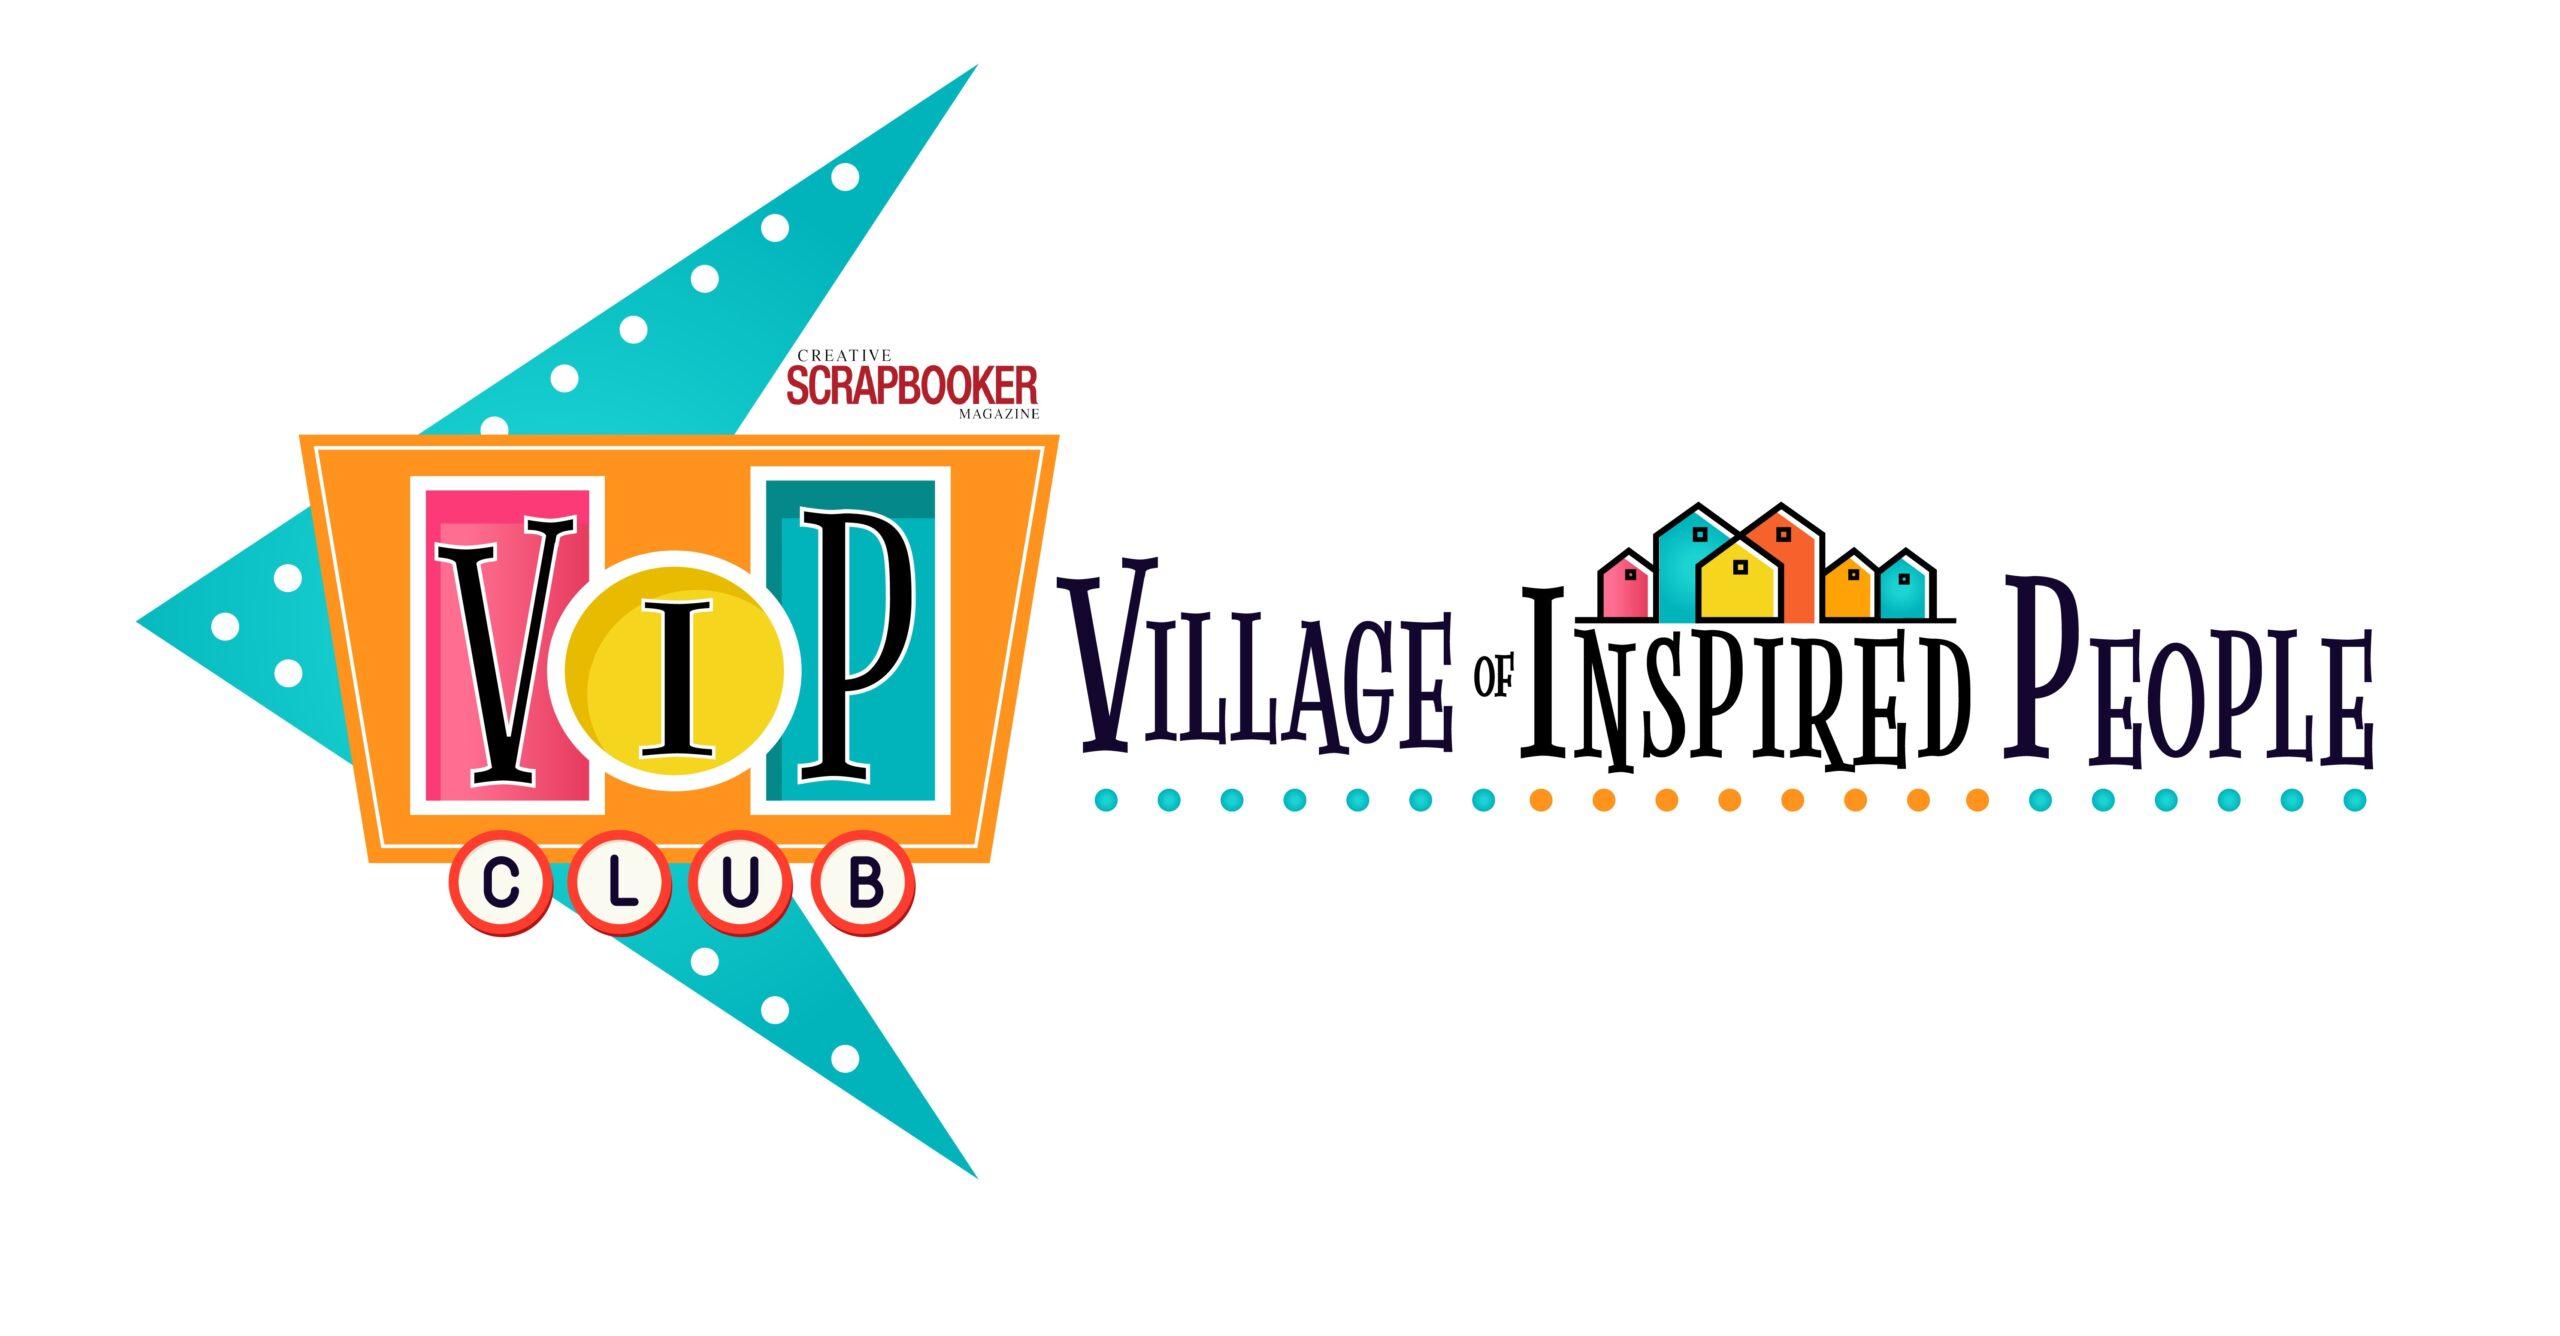 Creative Scrapbooker Magazine Village of Inspired People